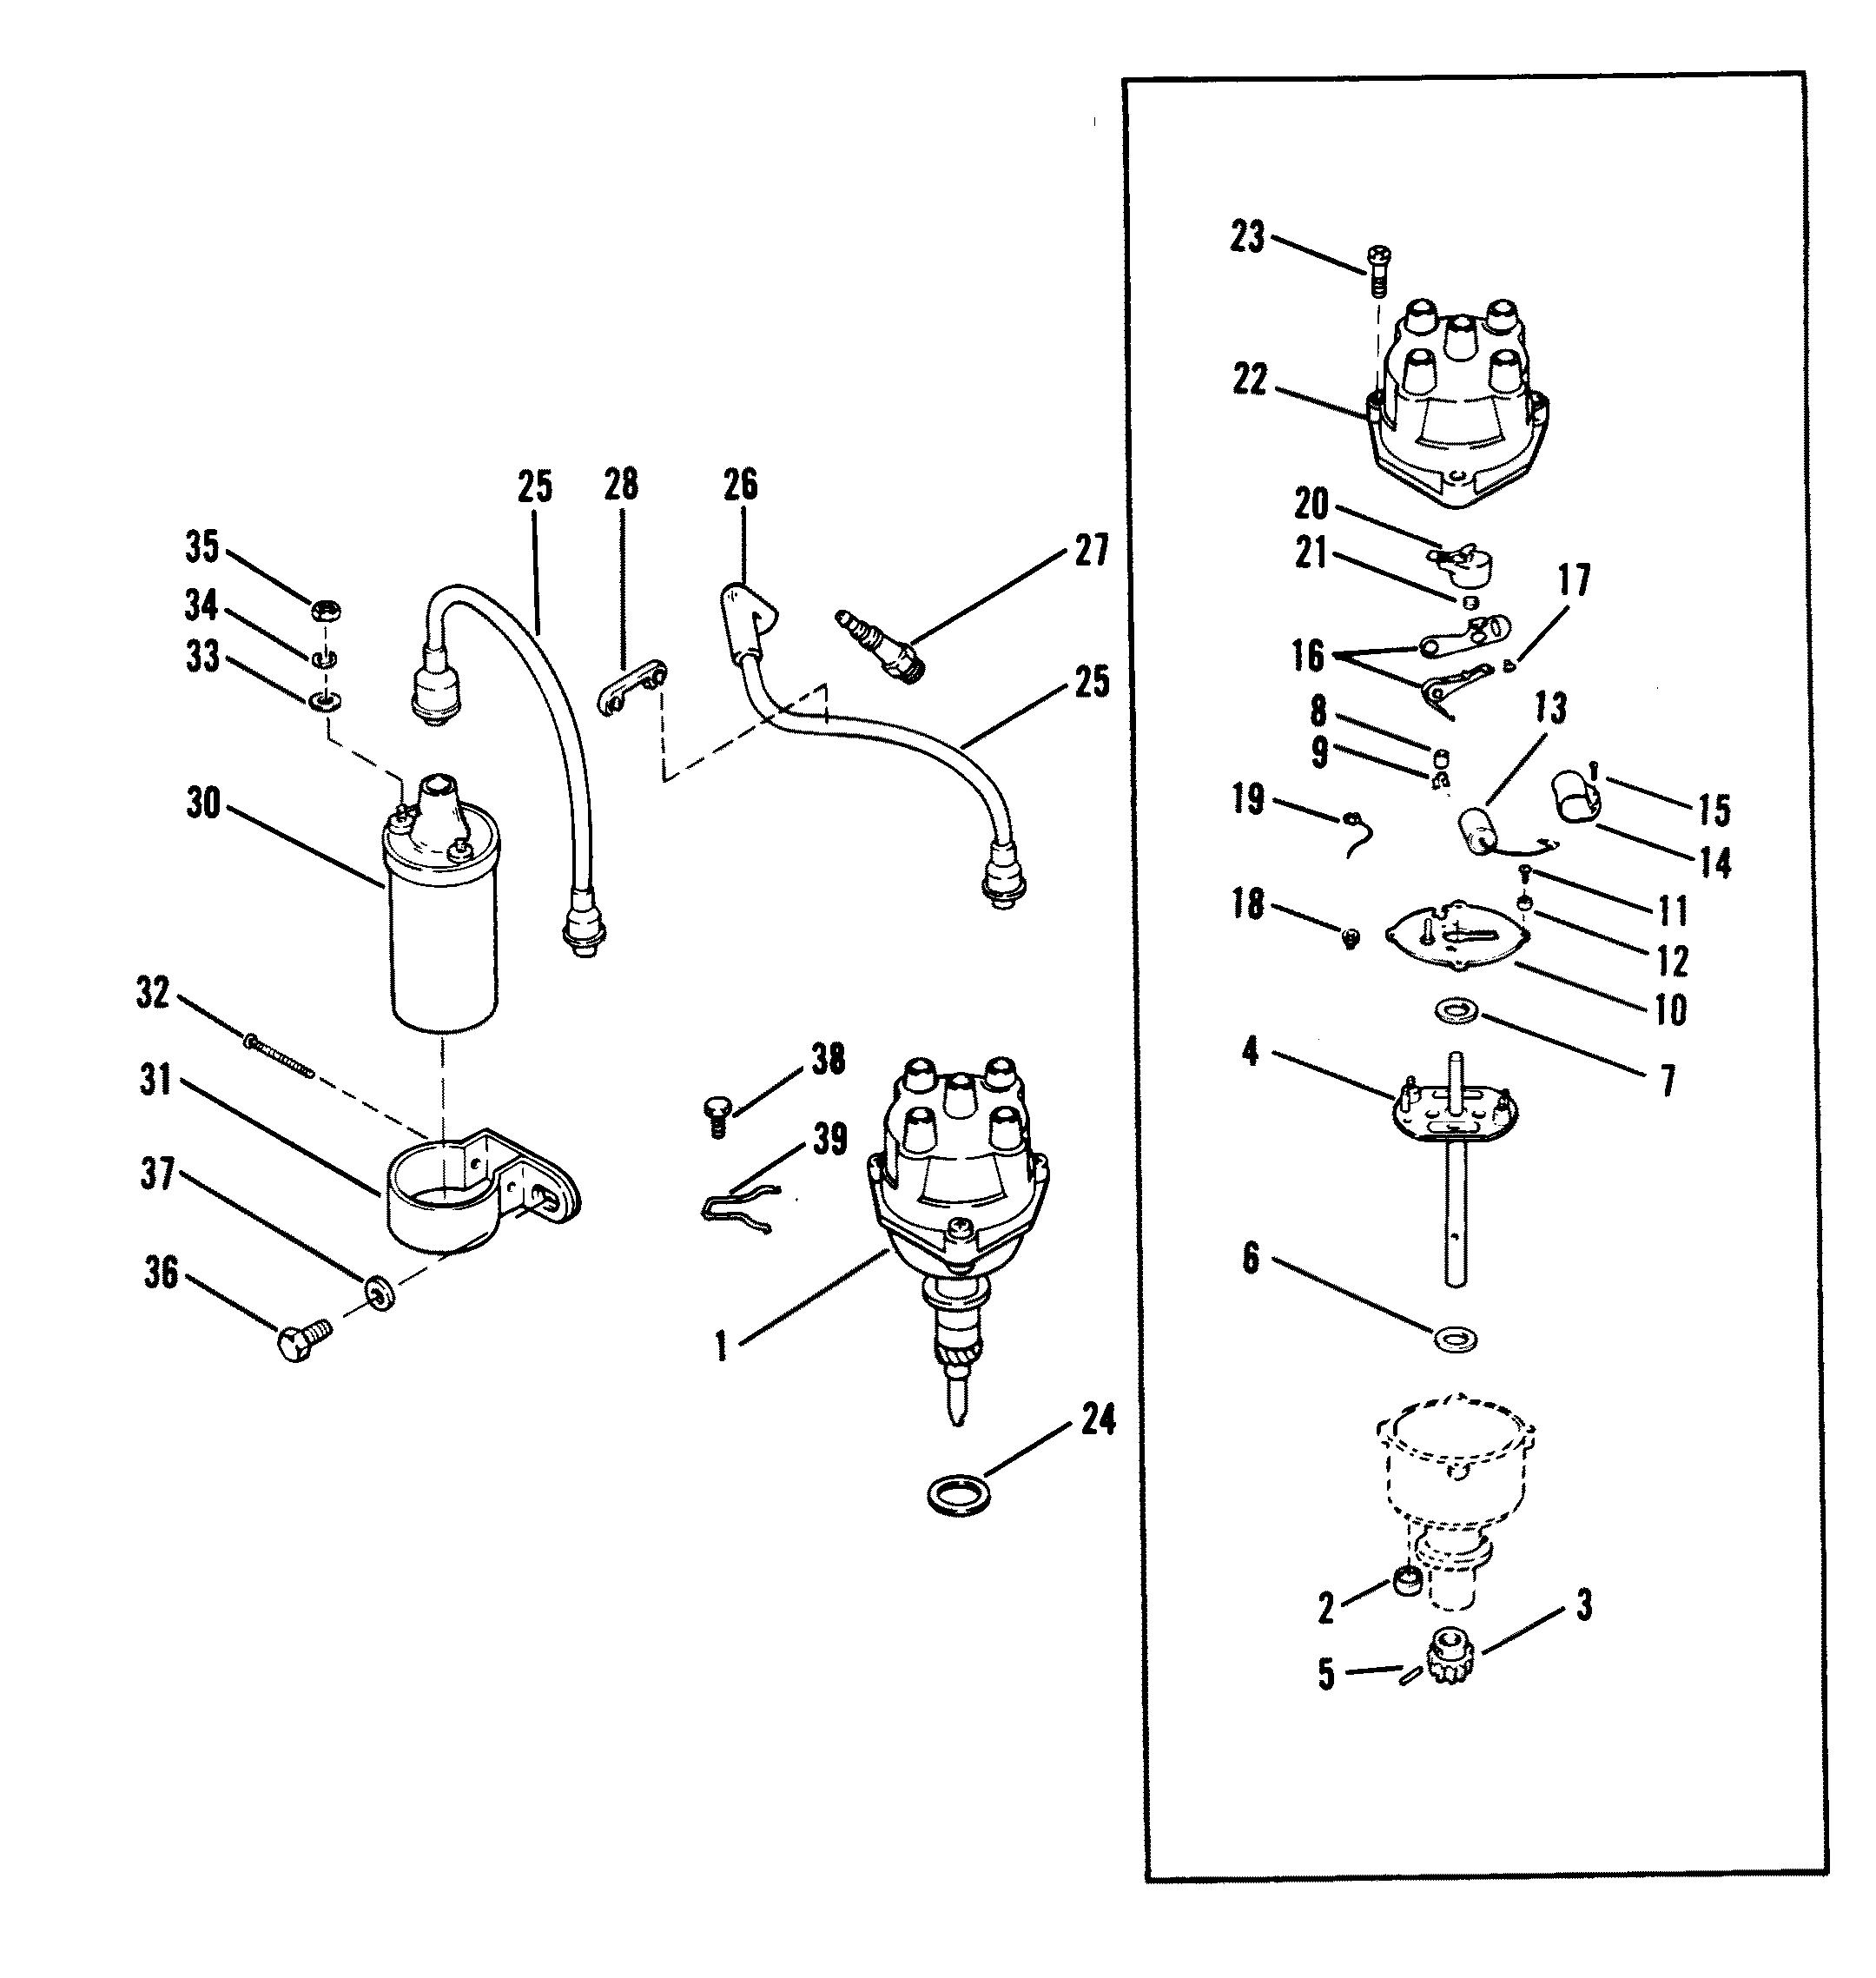 Pdf-8538] Mercruiser 1975 165 Starter Repair | 2019 Ebook Library - Mercruiser 3.0 Wiring Diagram